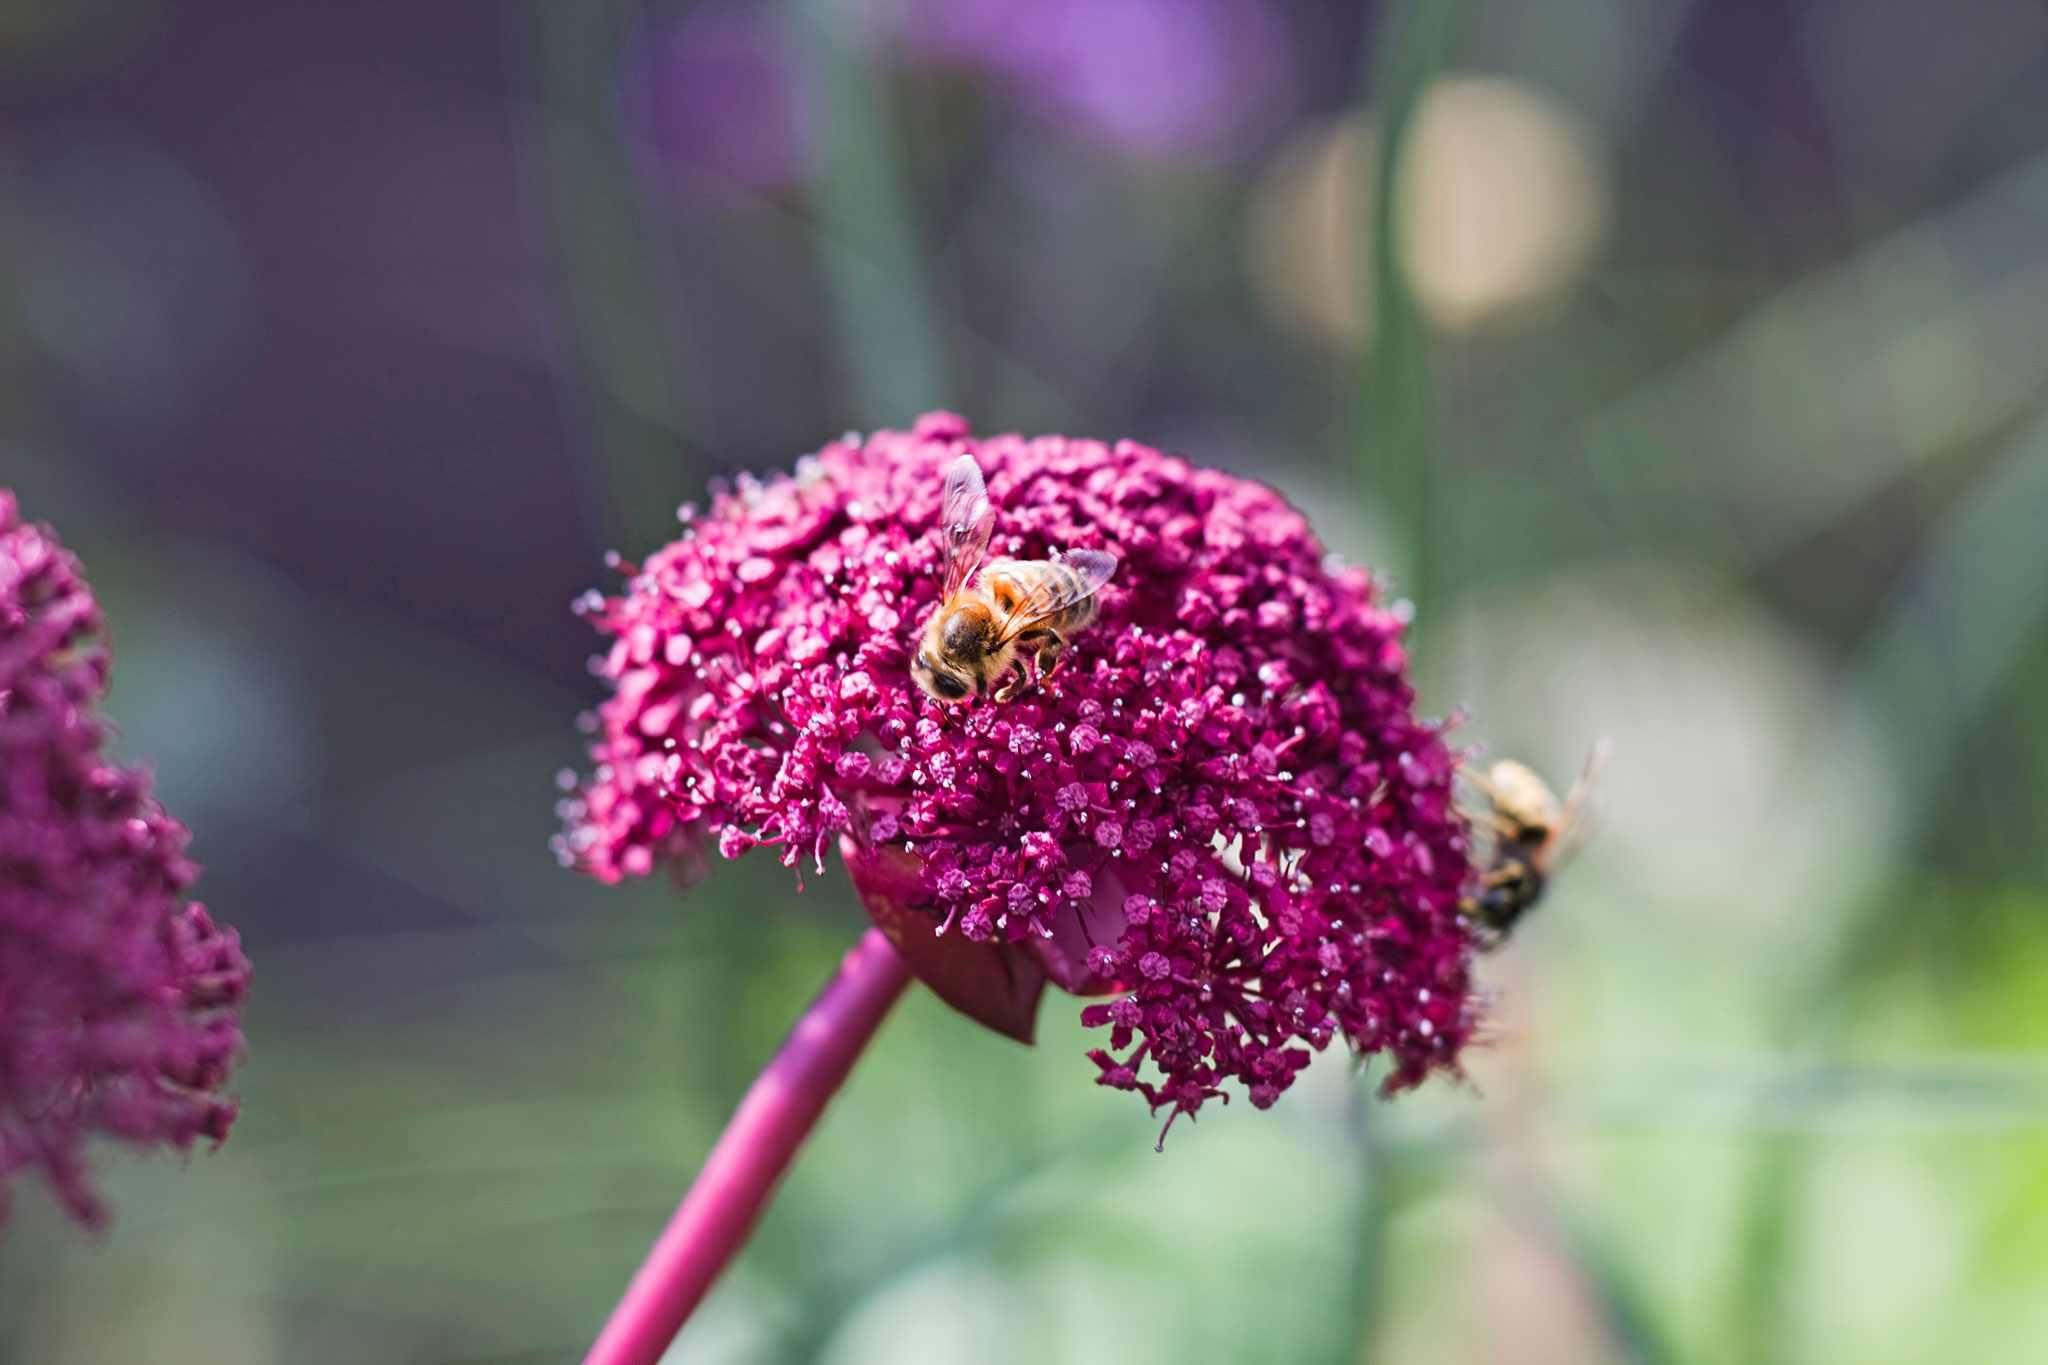 Bees on a magenta flowerhead